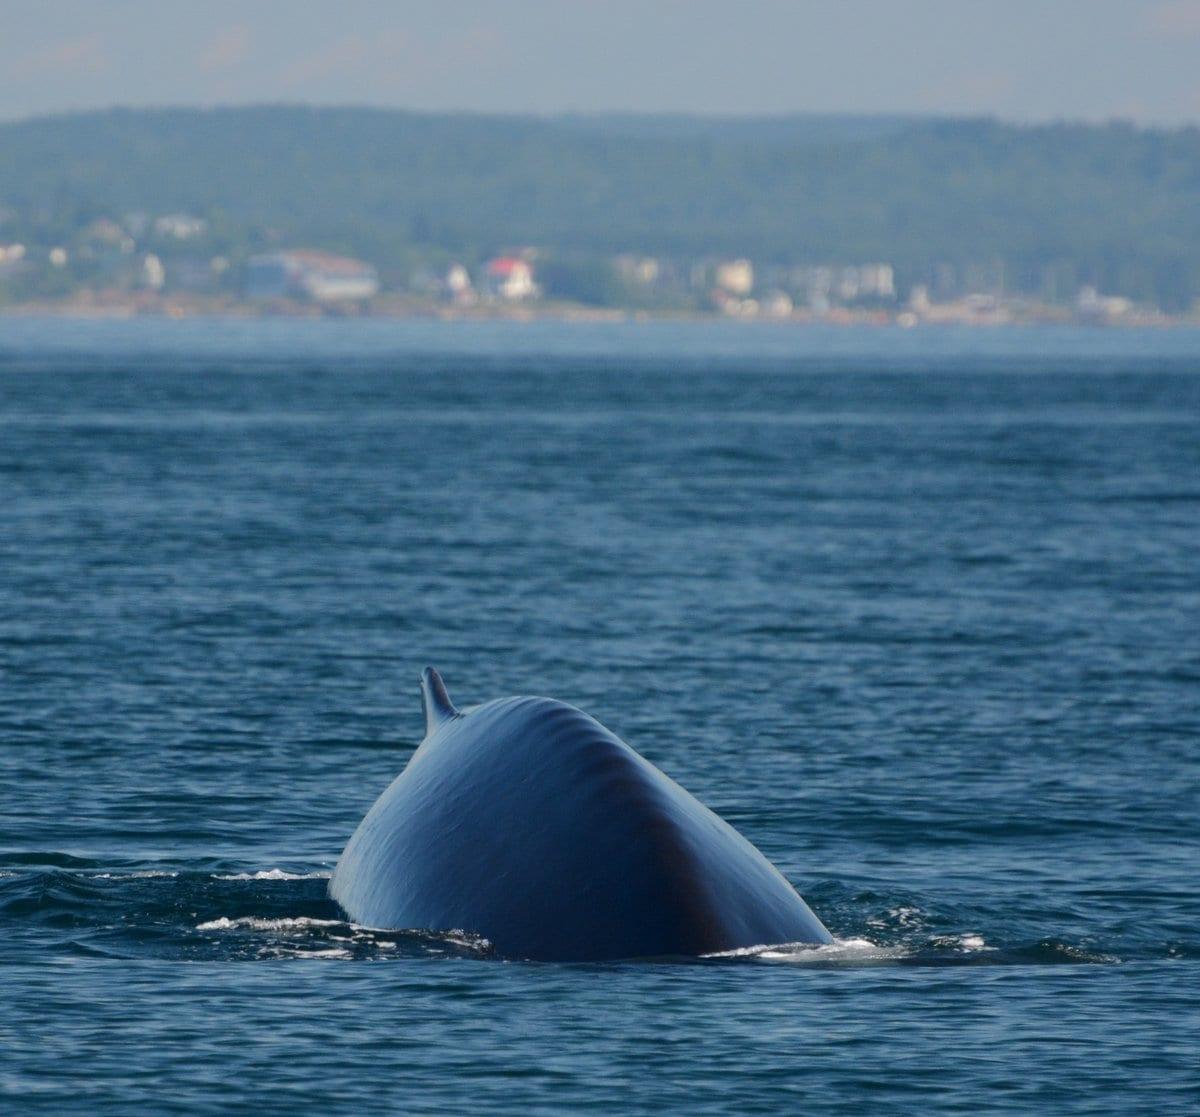 Fin whale on a terminal dive